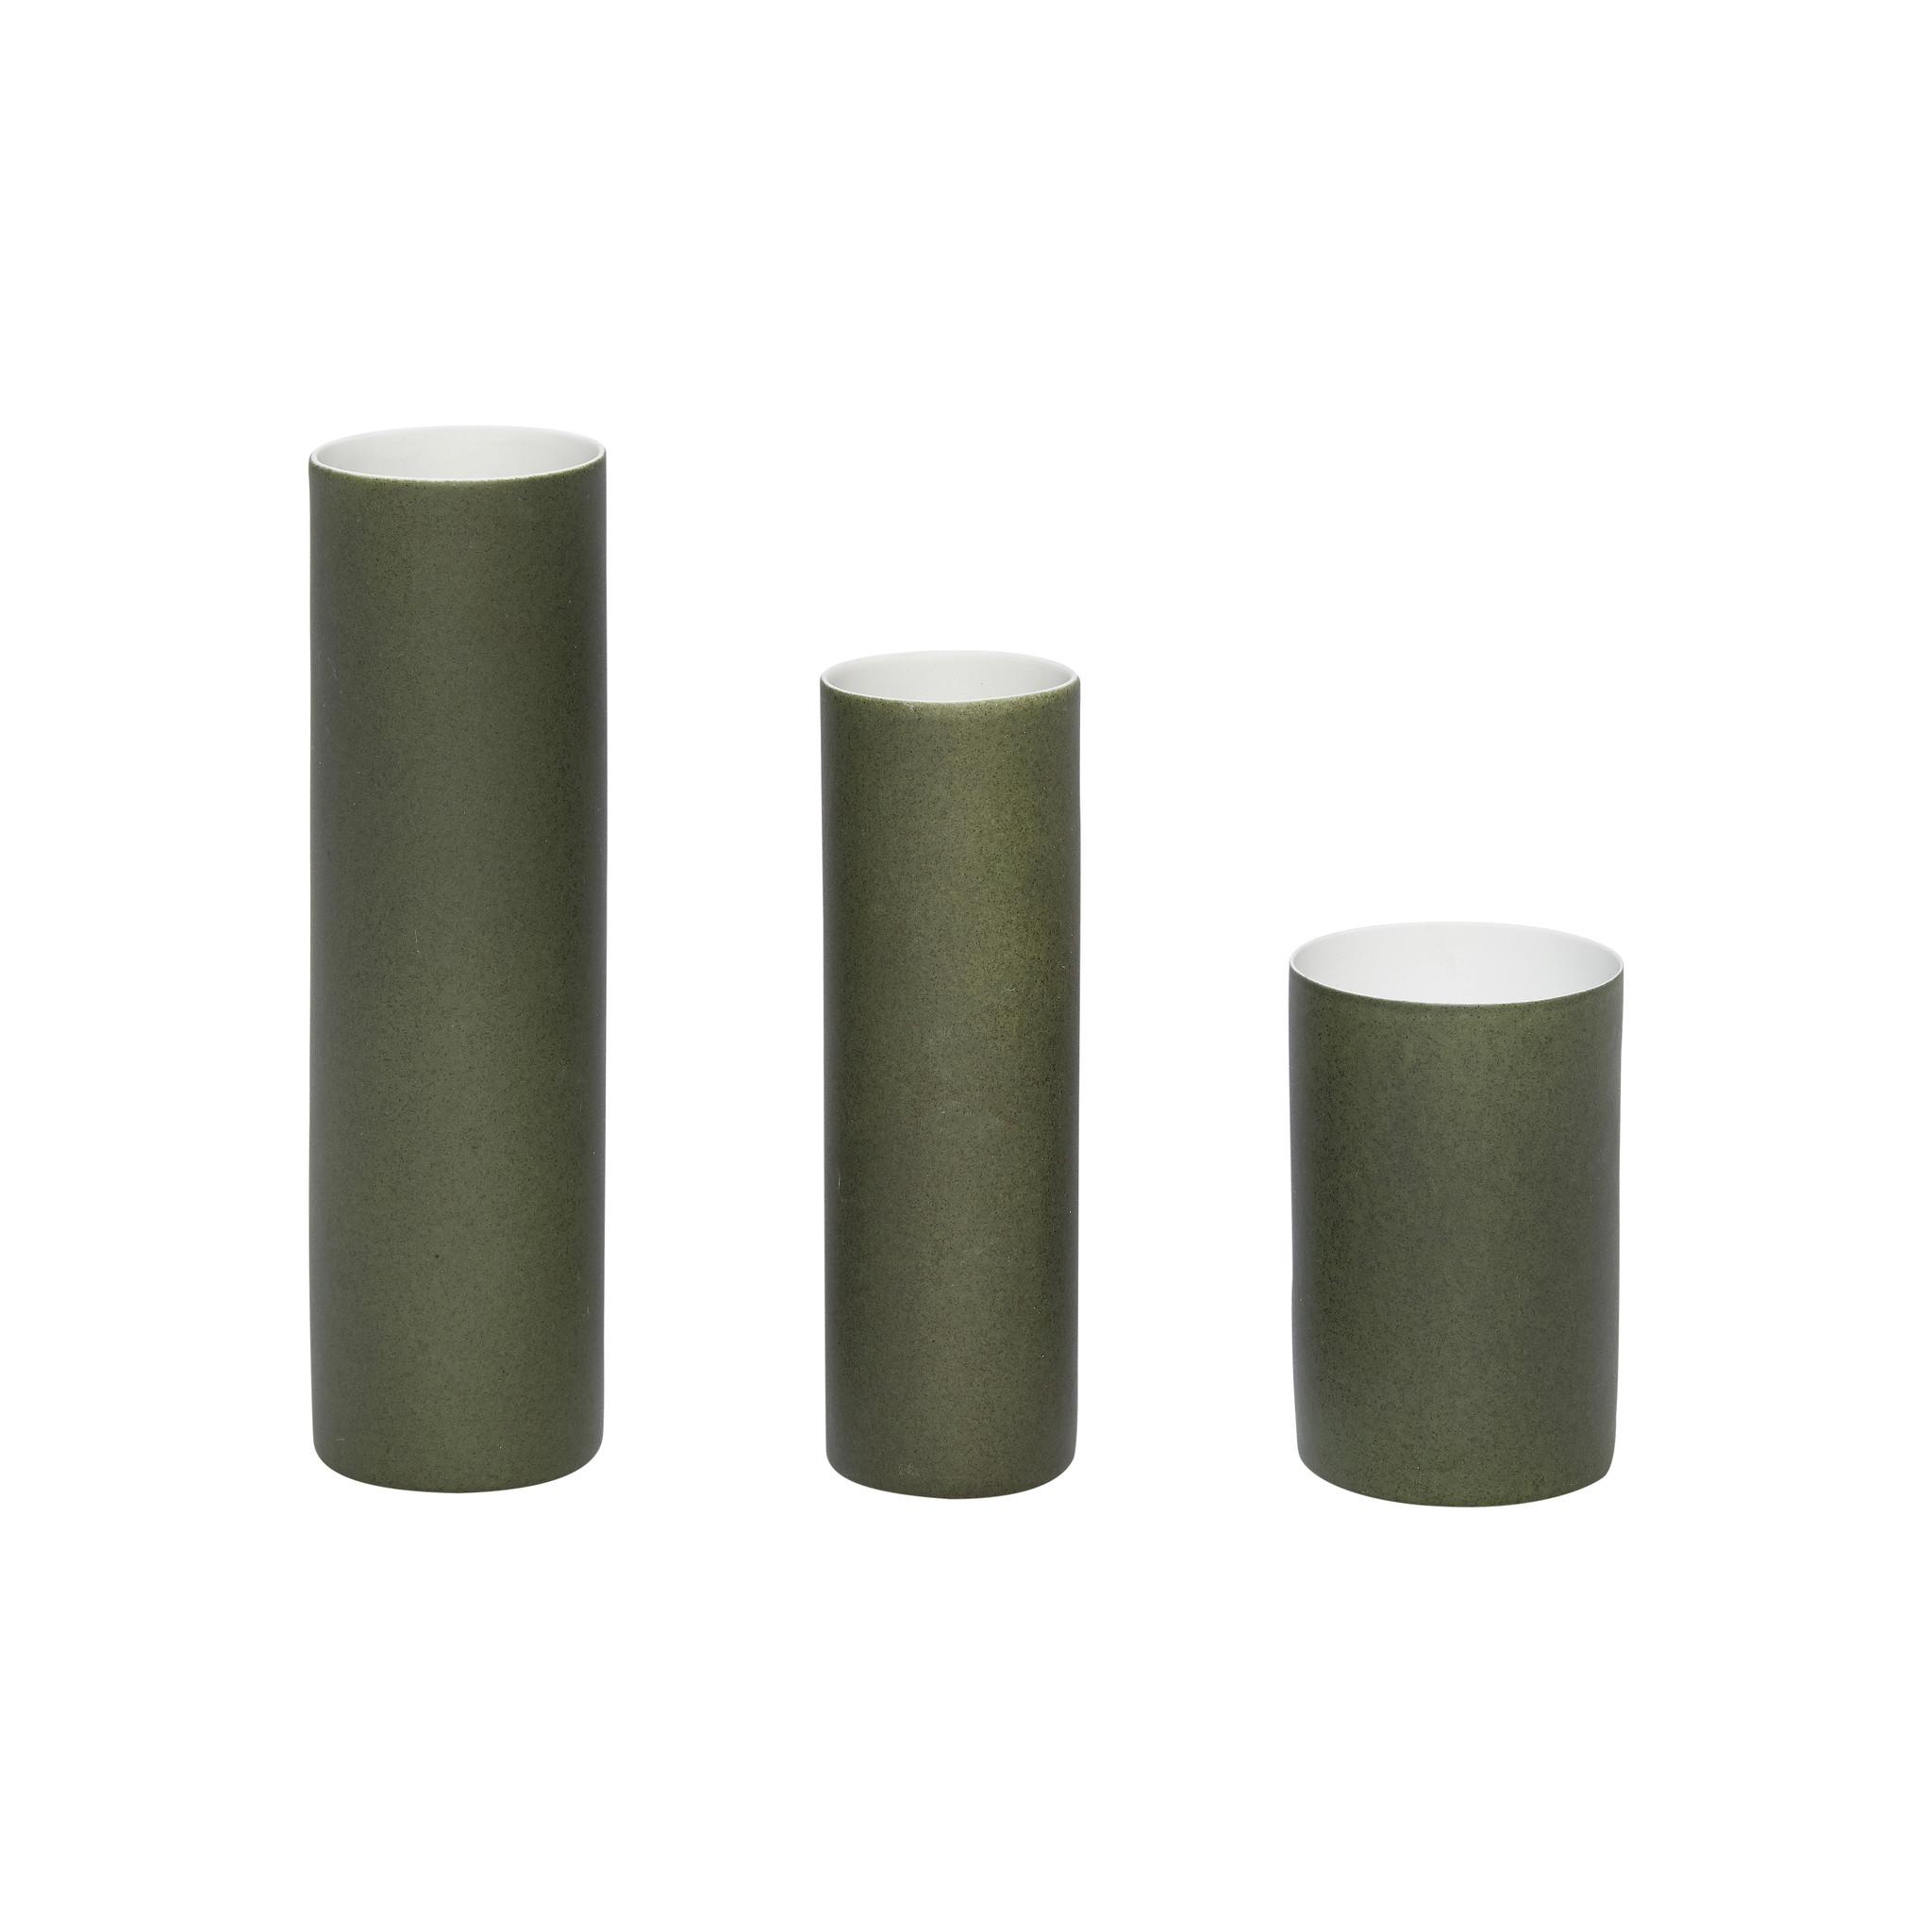 Hubsch Vaas, porselein, groen, set van 3-420304-5712772054734